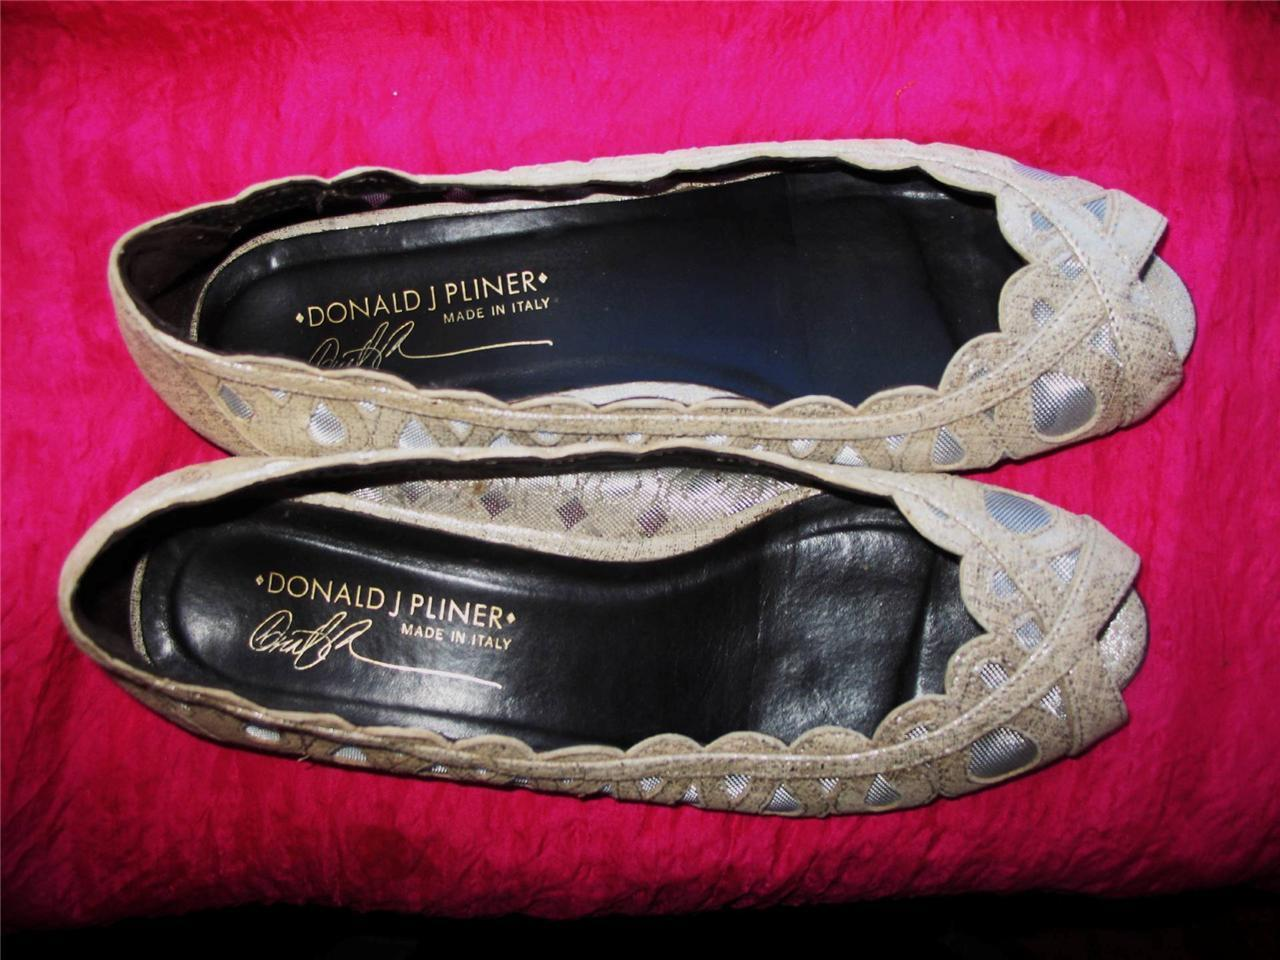 DONALD J PLINER  Schuhe ELAMA SILVER  PLINER BALLET FLAT  SIZE 6,5 M/37  MADE IN ITALY 187c9c